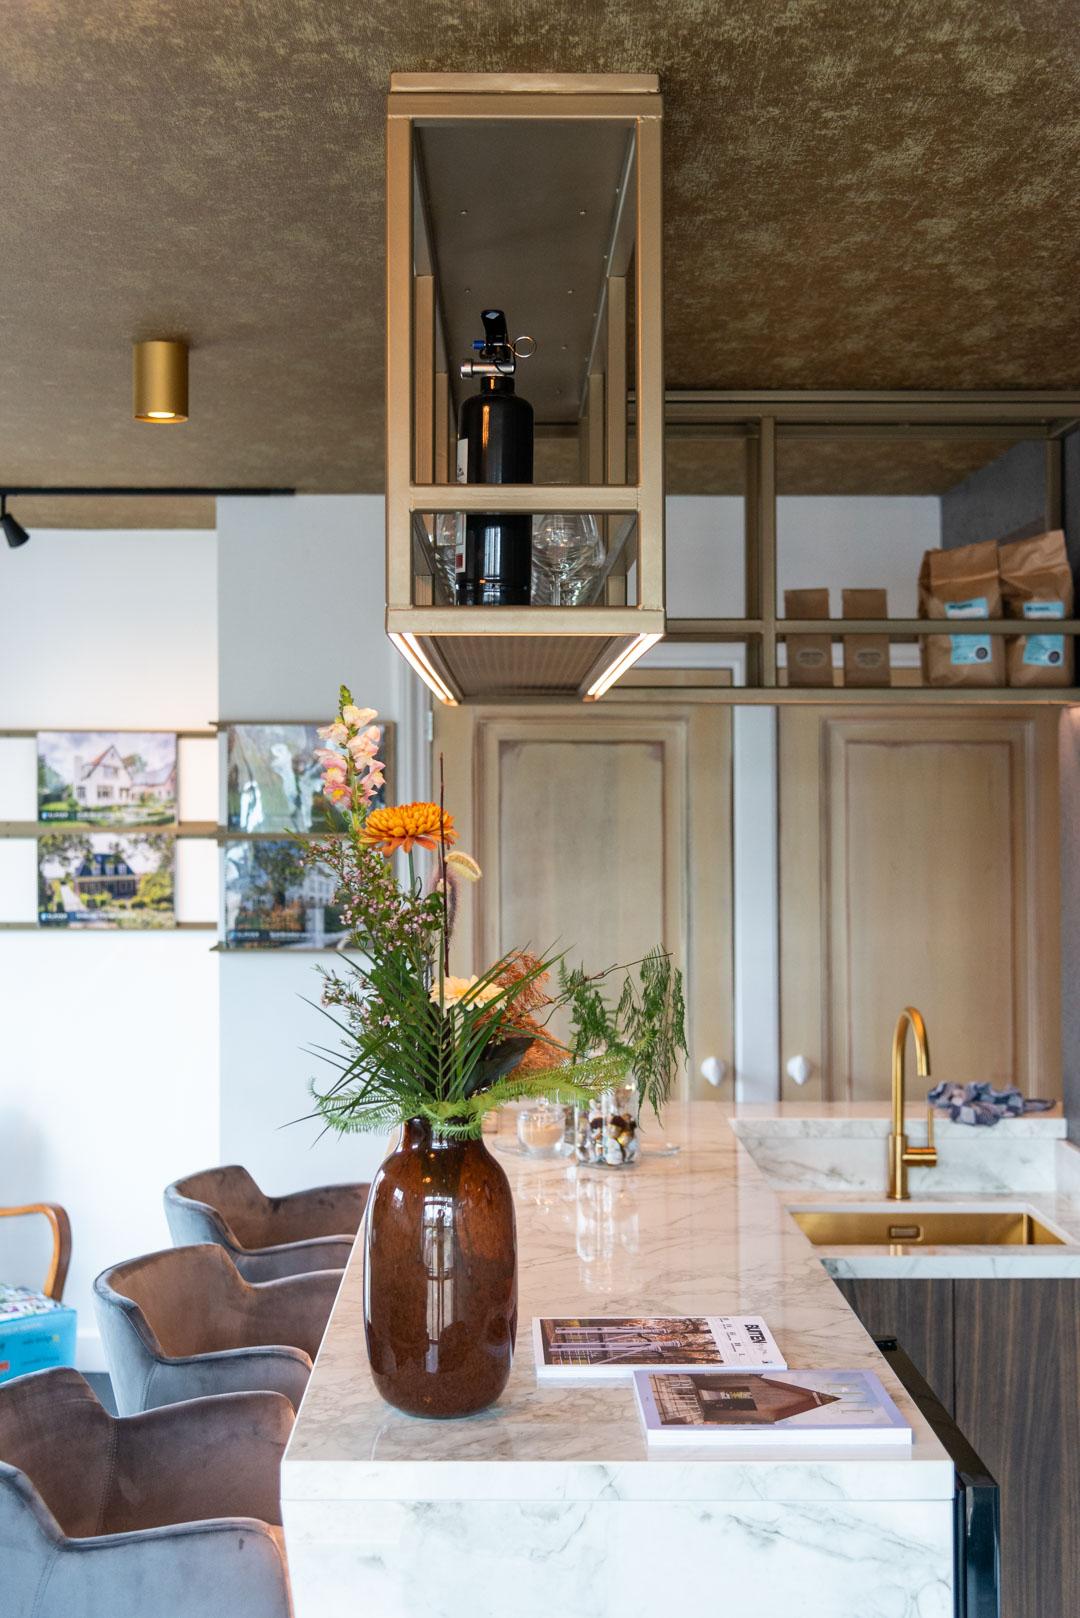 Handgemaakte hospitality keuken van fraké hout